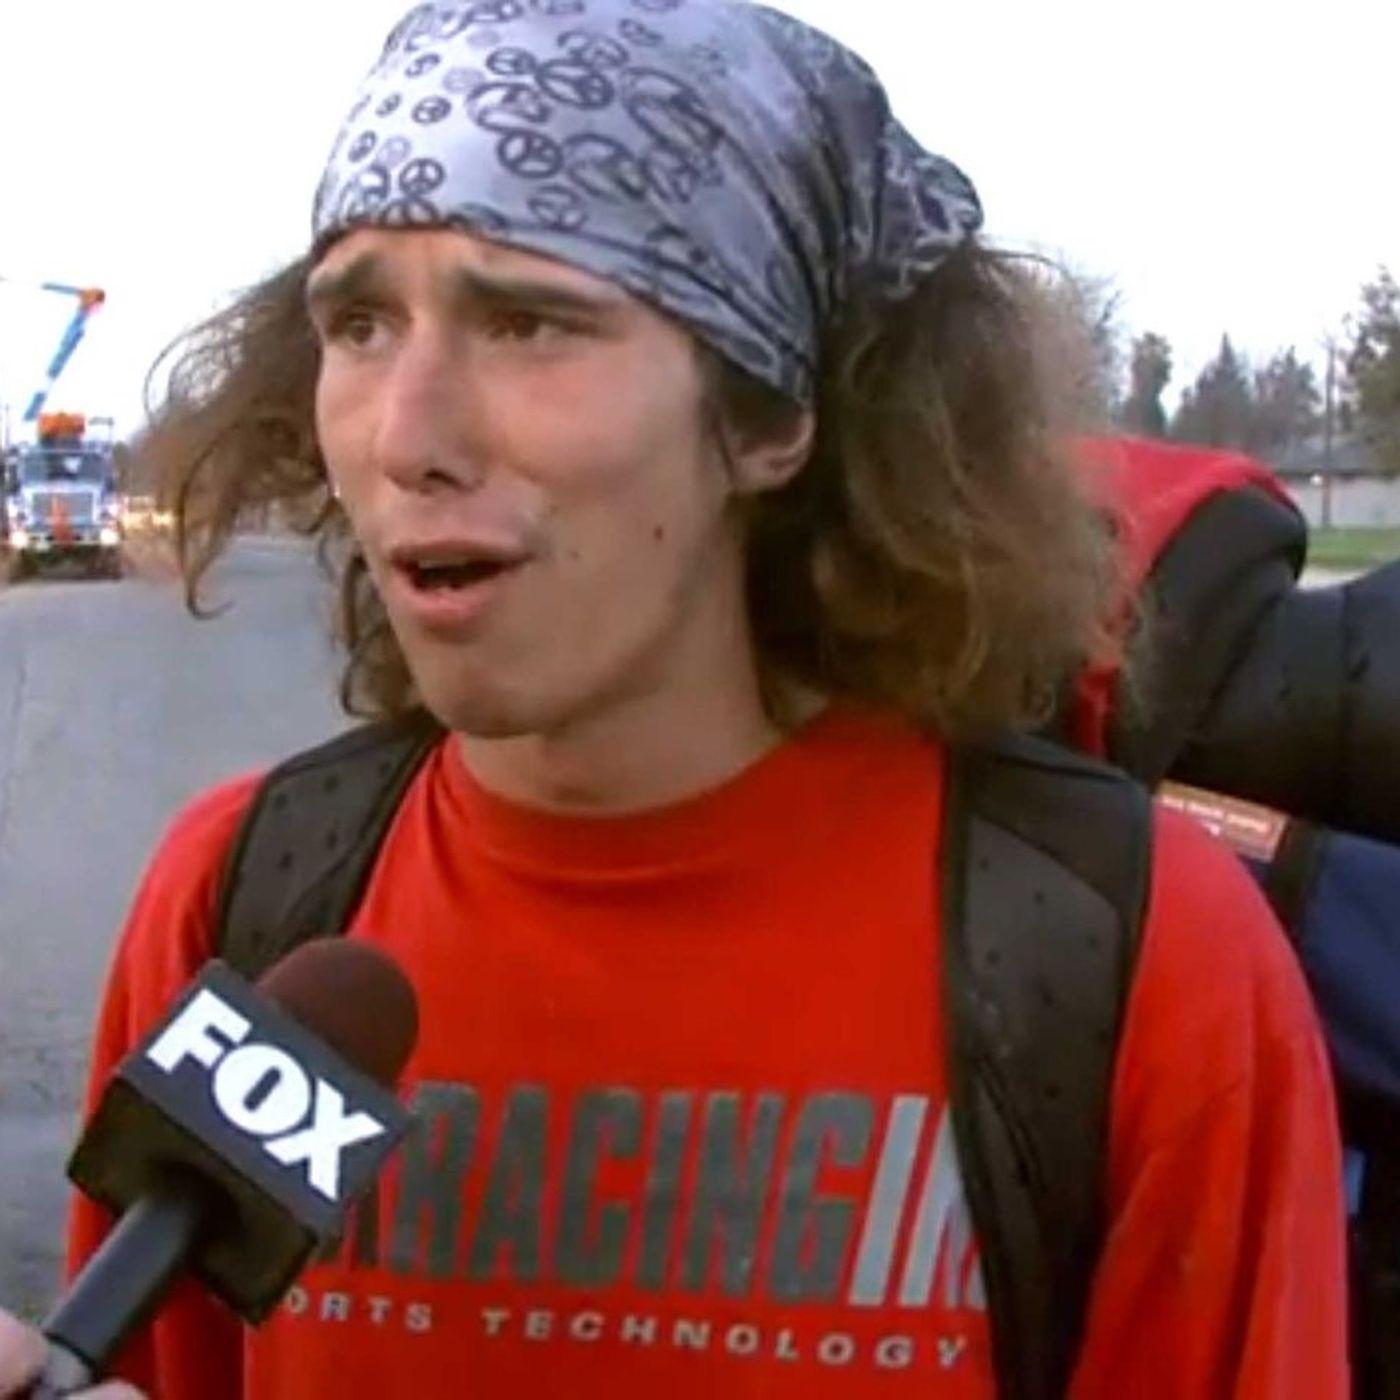 Caleb Lawrence McGillvary aka Kai the Hatchet-Wielding Hitchhiker